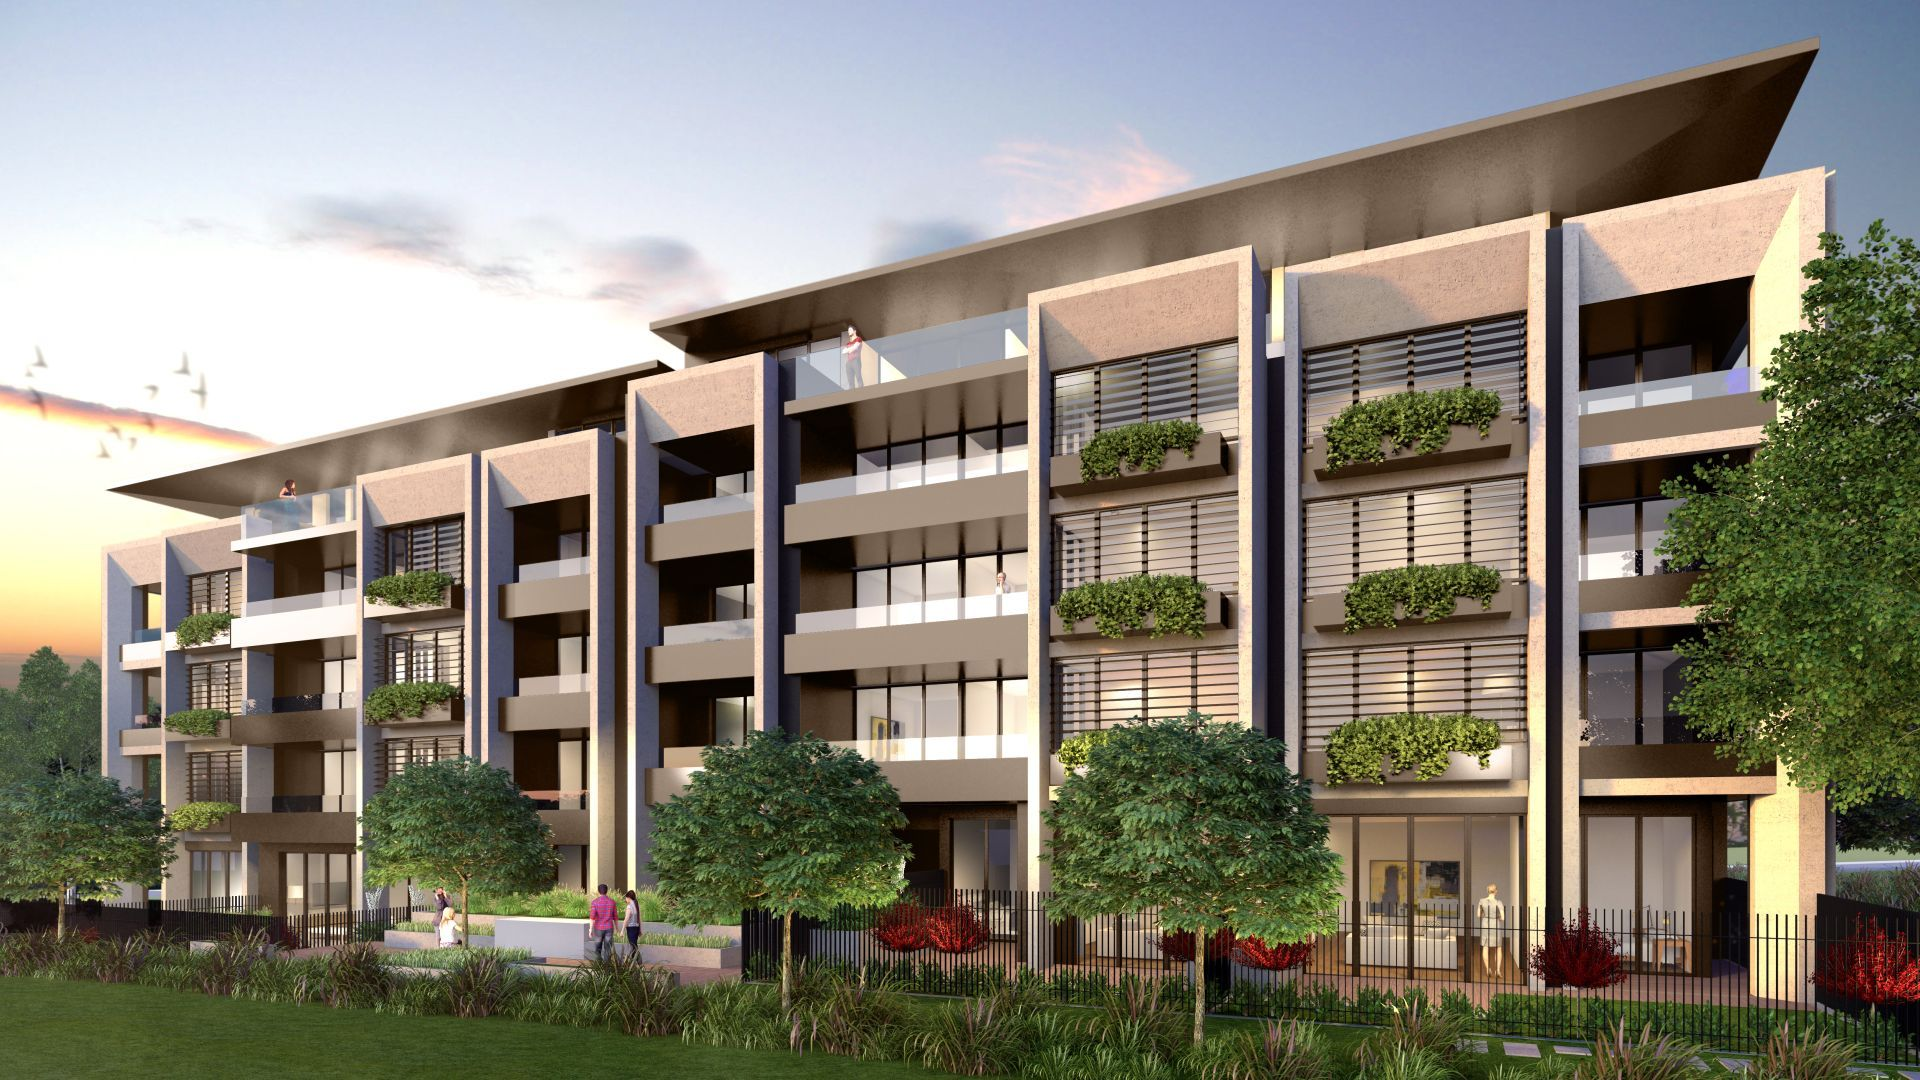 41/10-16 Gilroy Road, Turramurra NSW 2074, Image 1